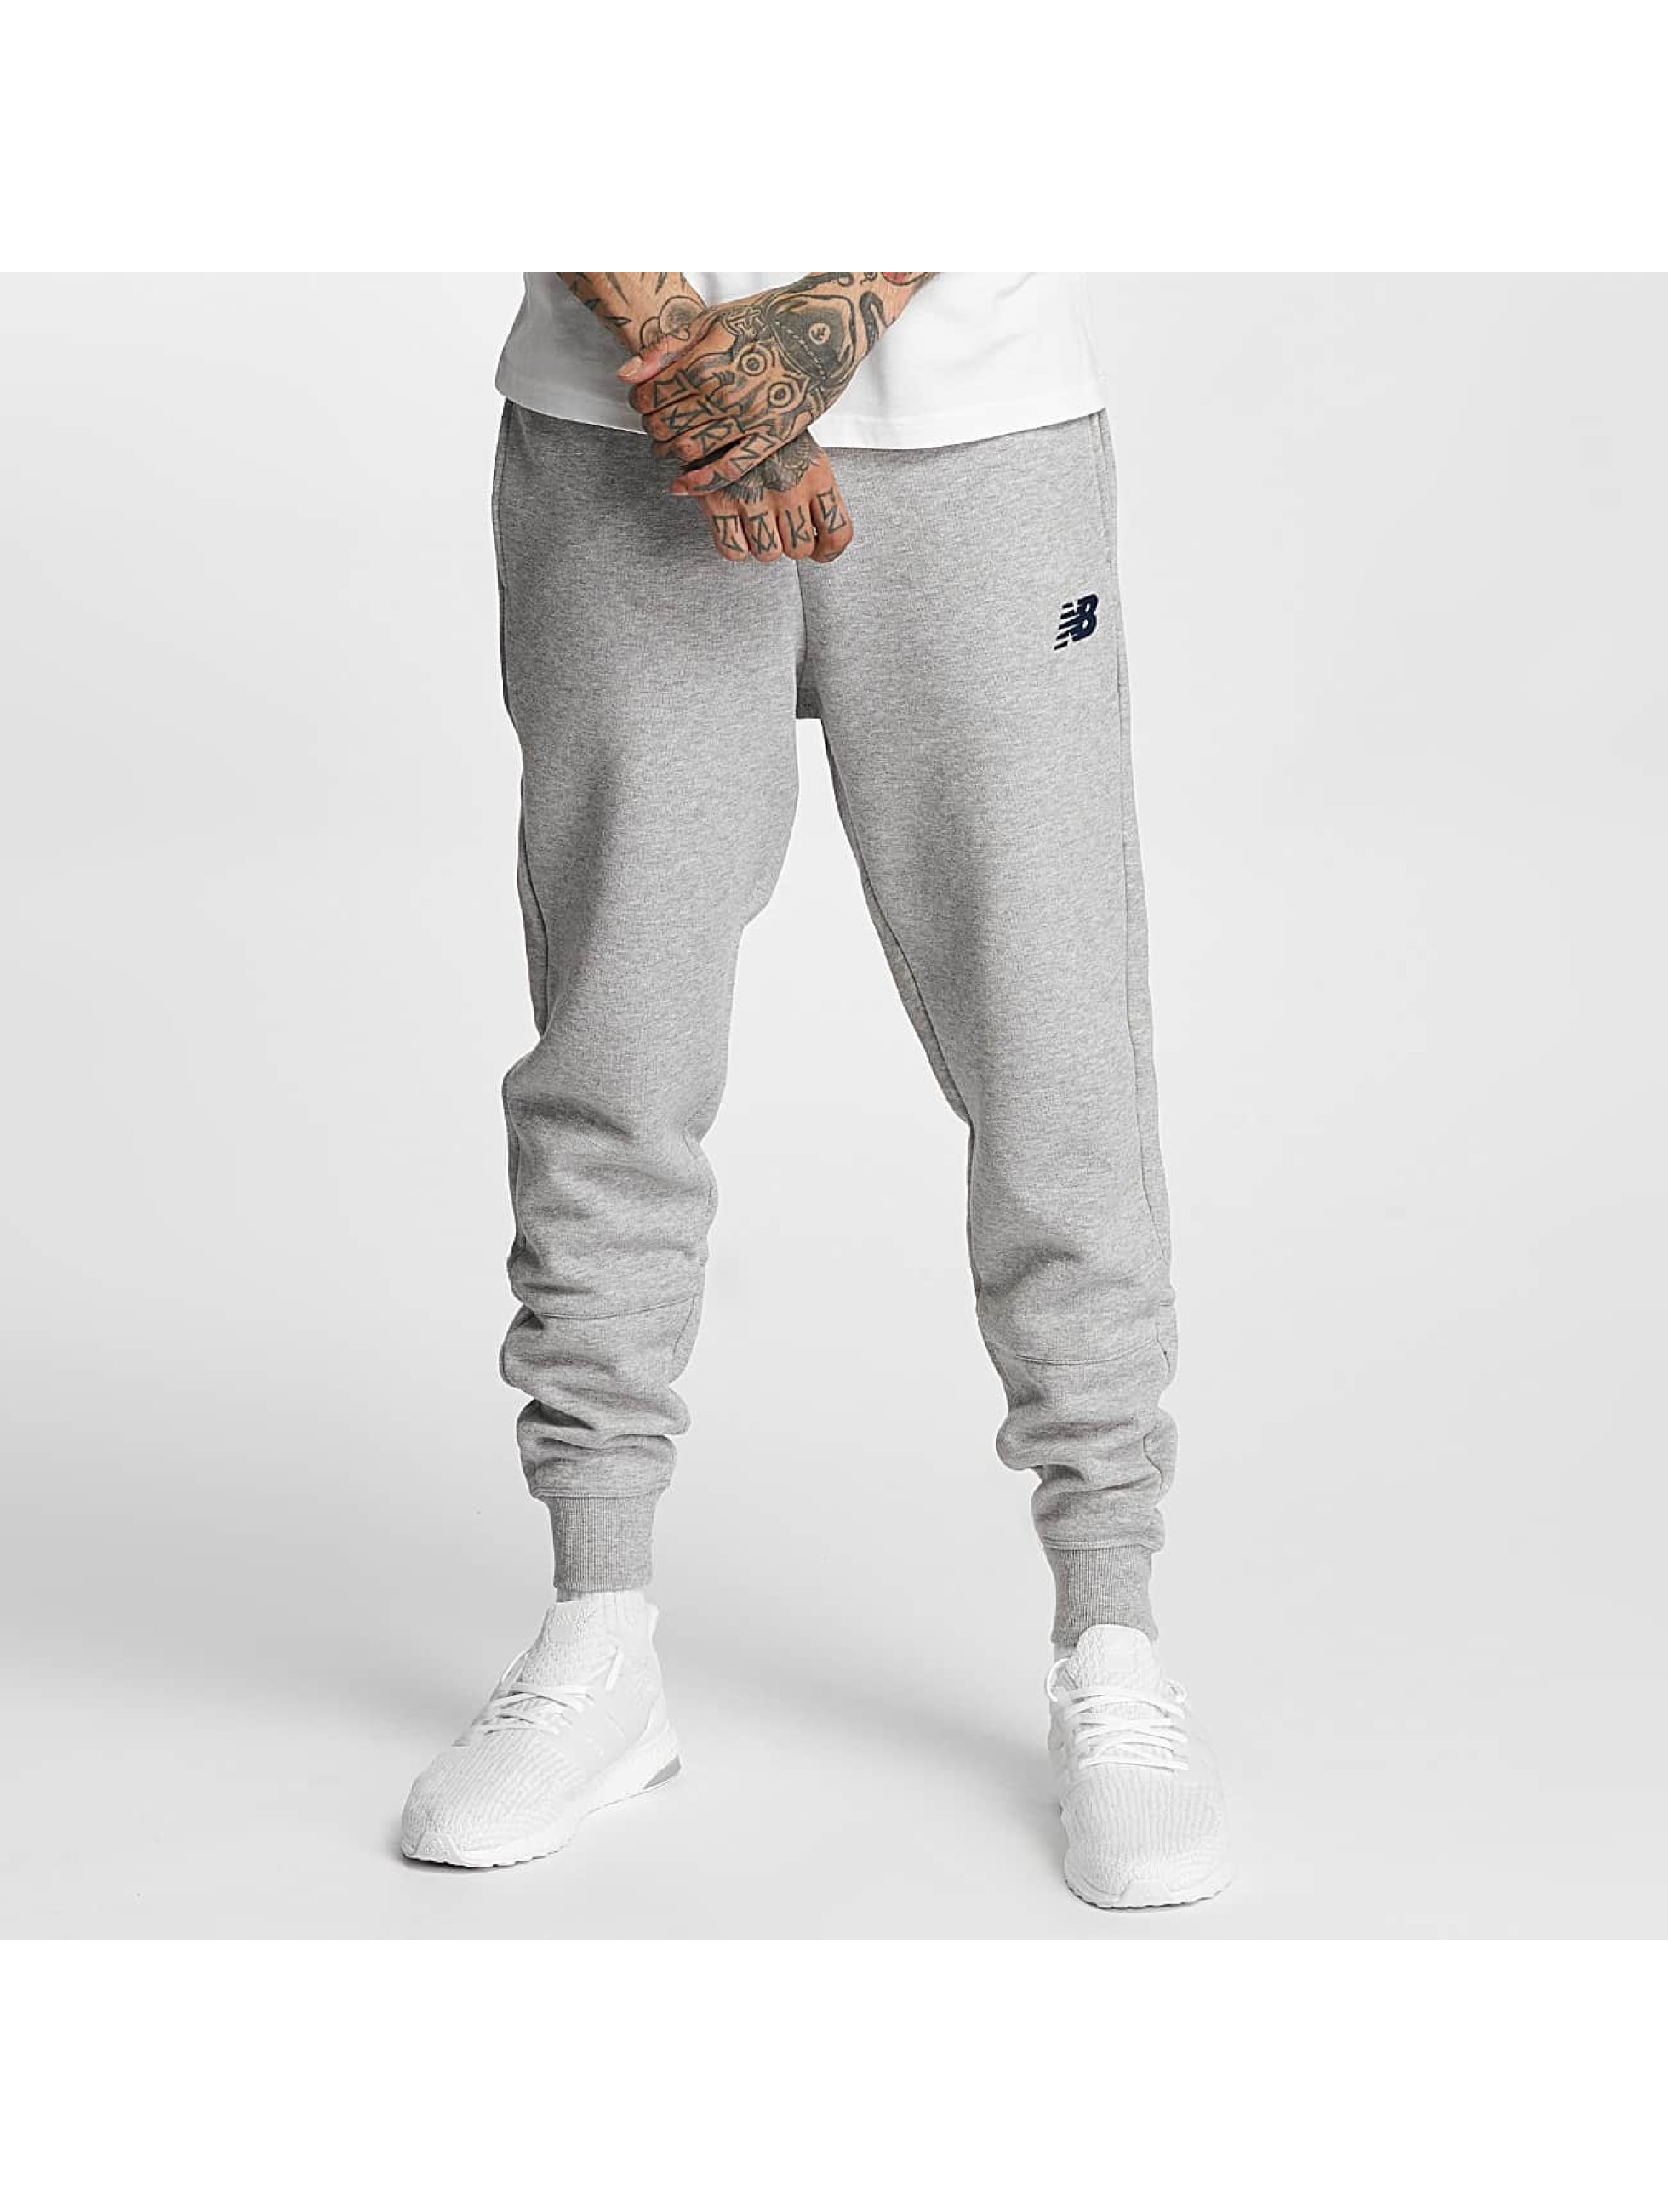 New Balance Spodnie do joggingu Essentials szary